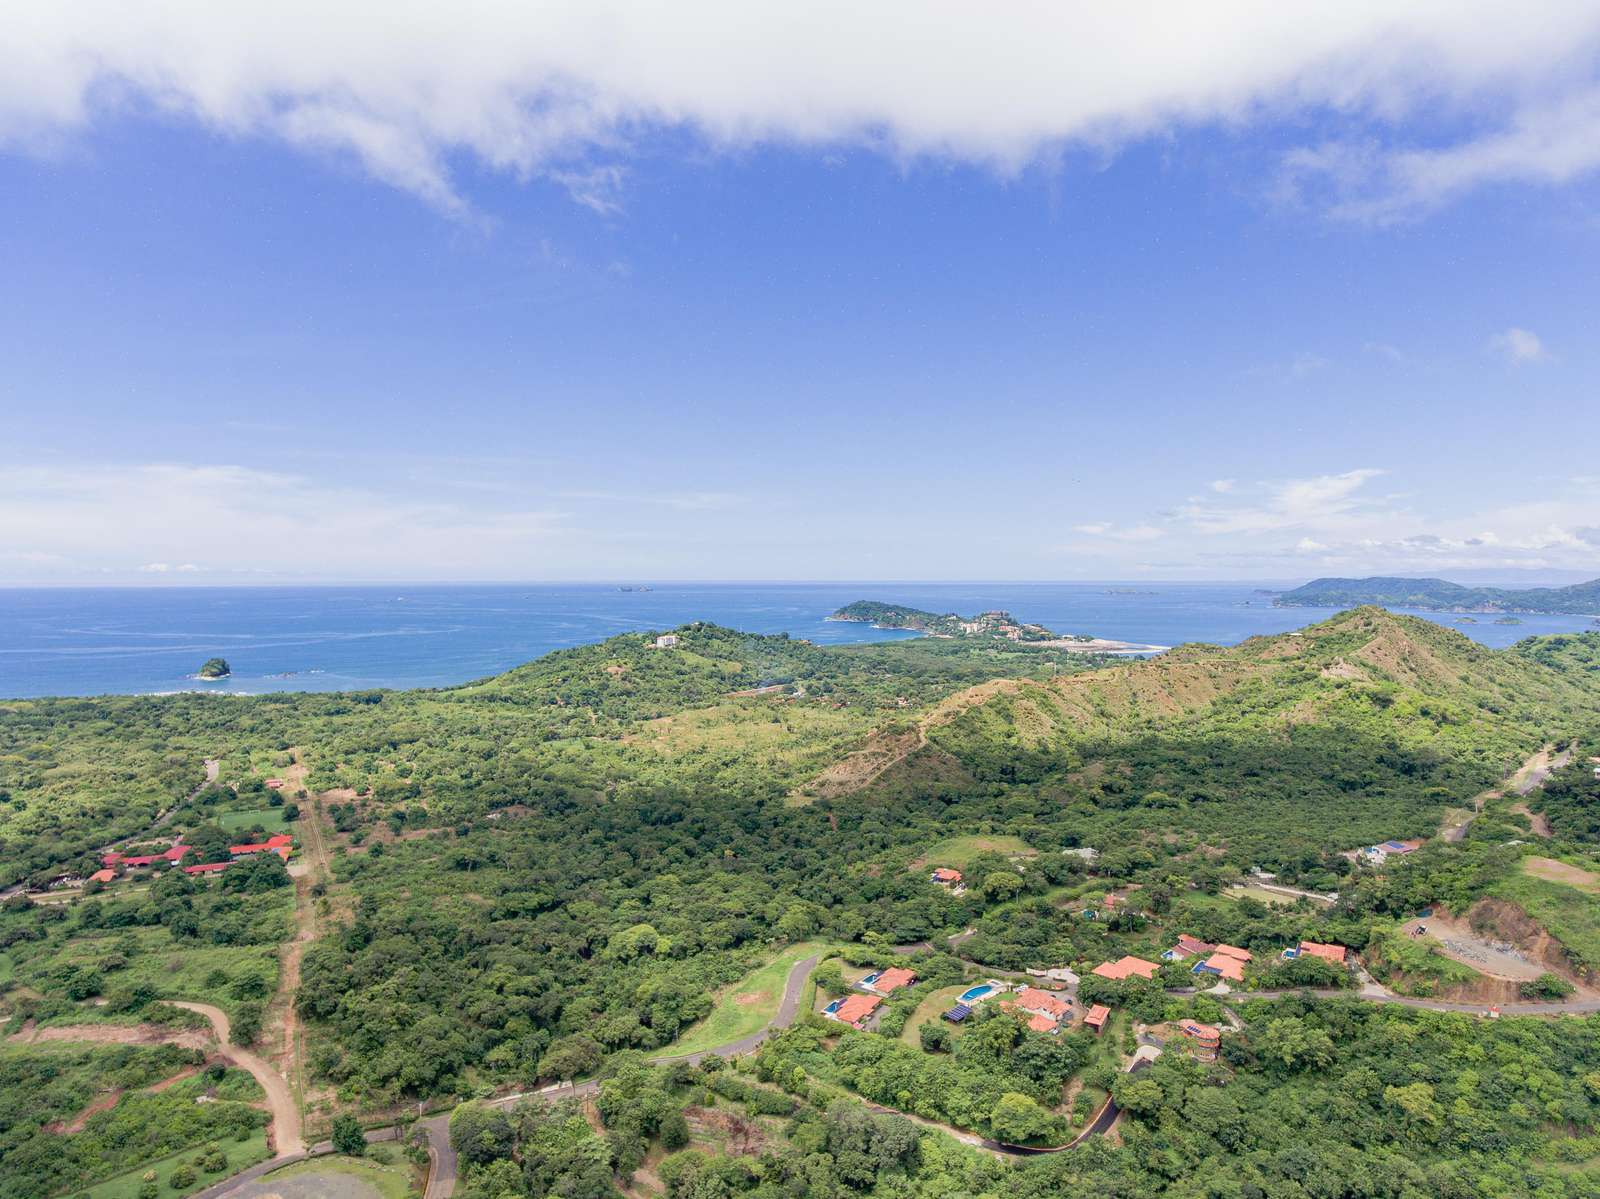 Amazing aerial and ocean views